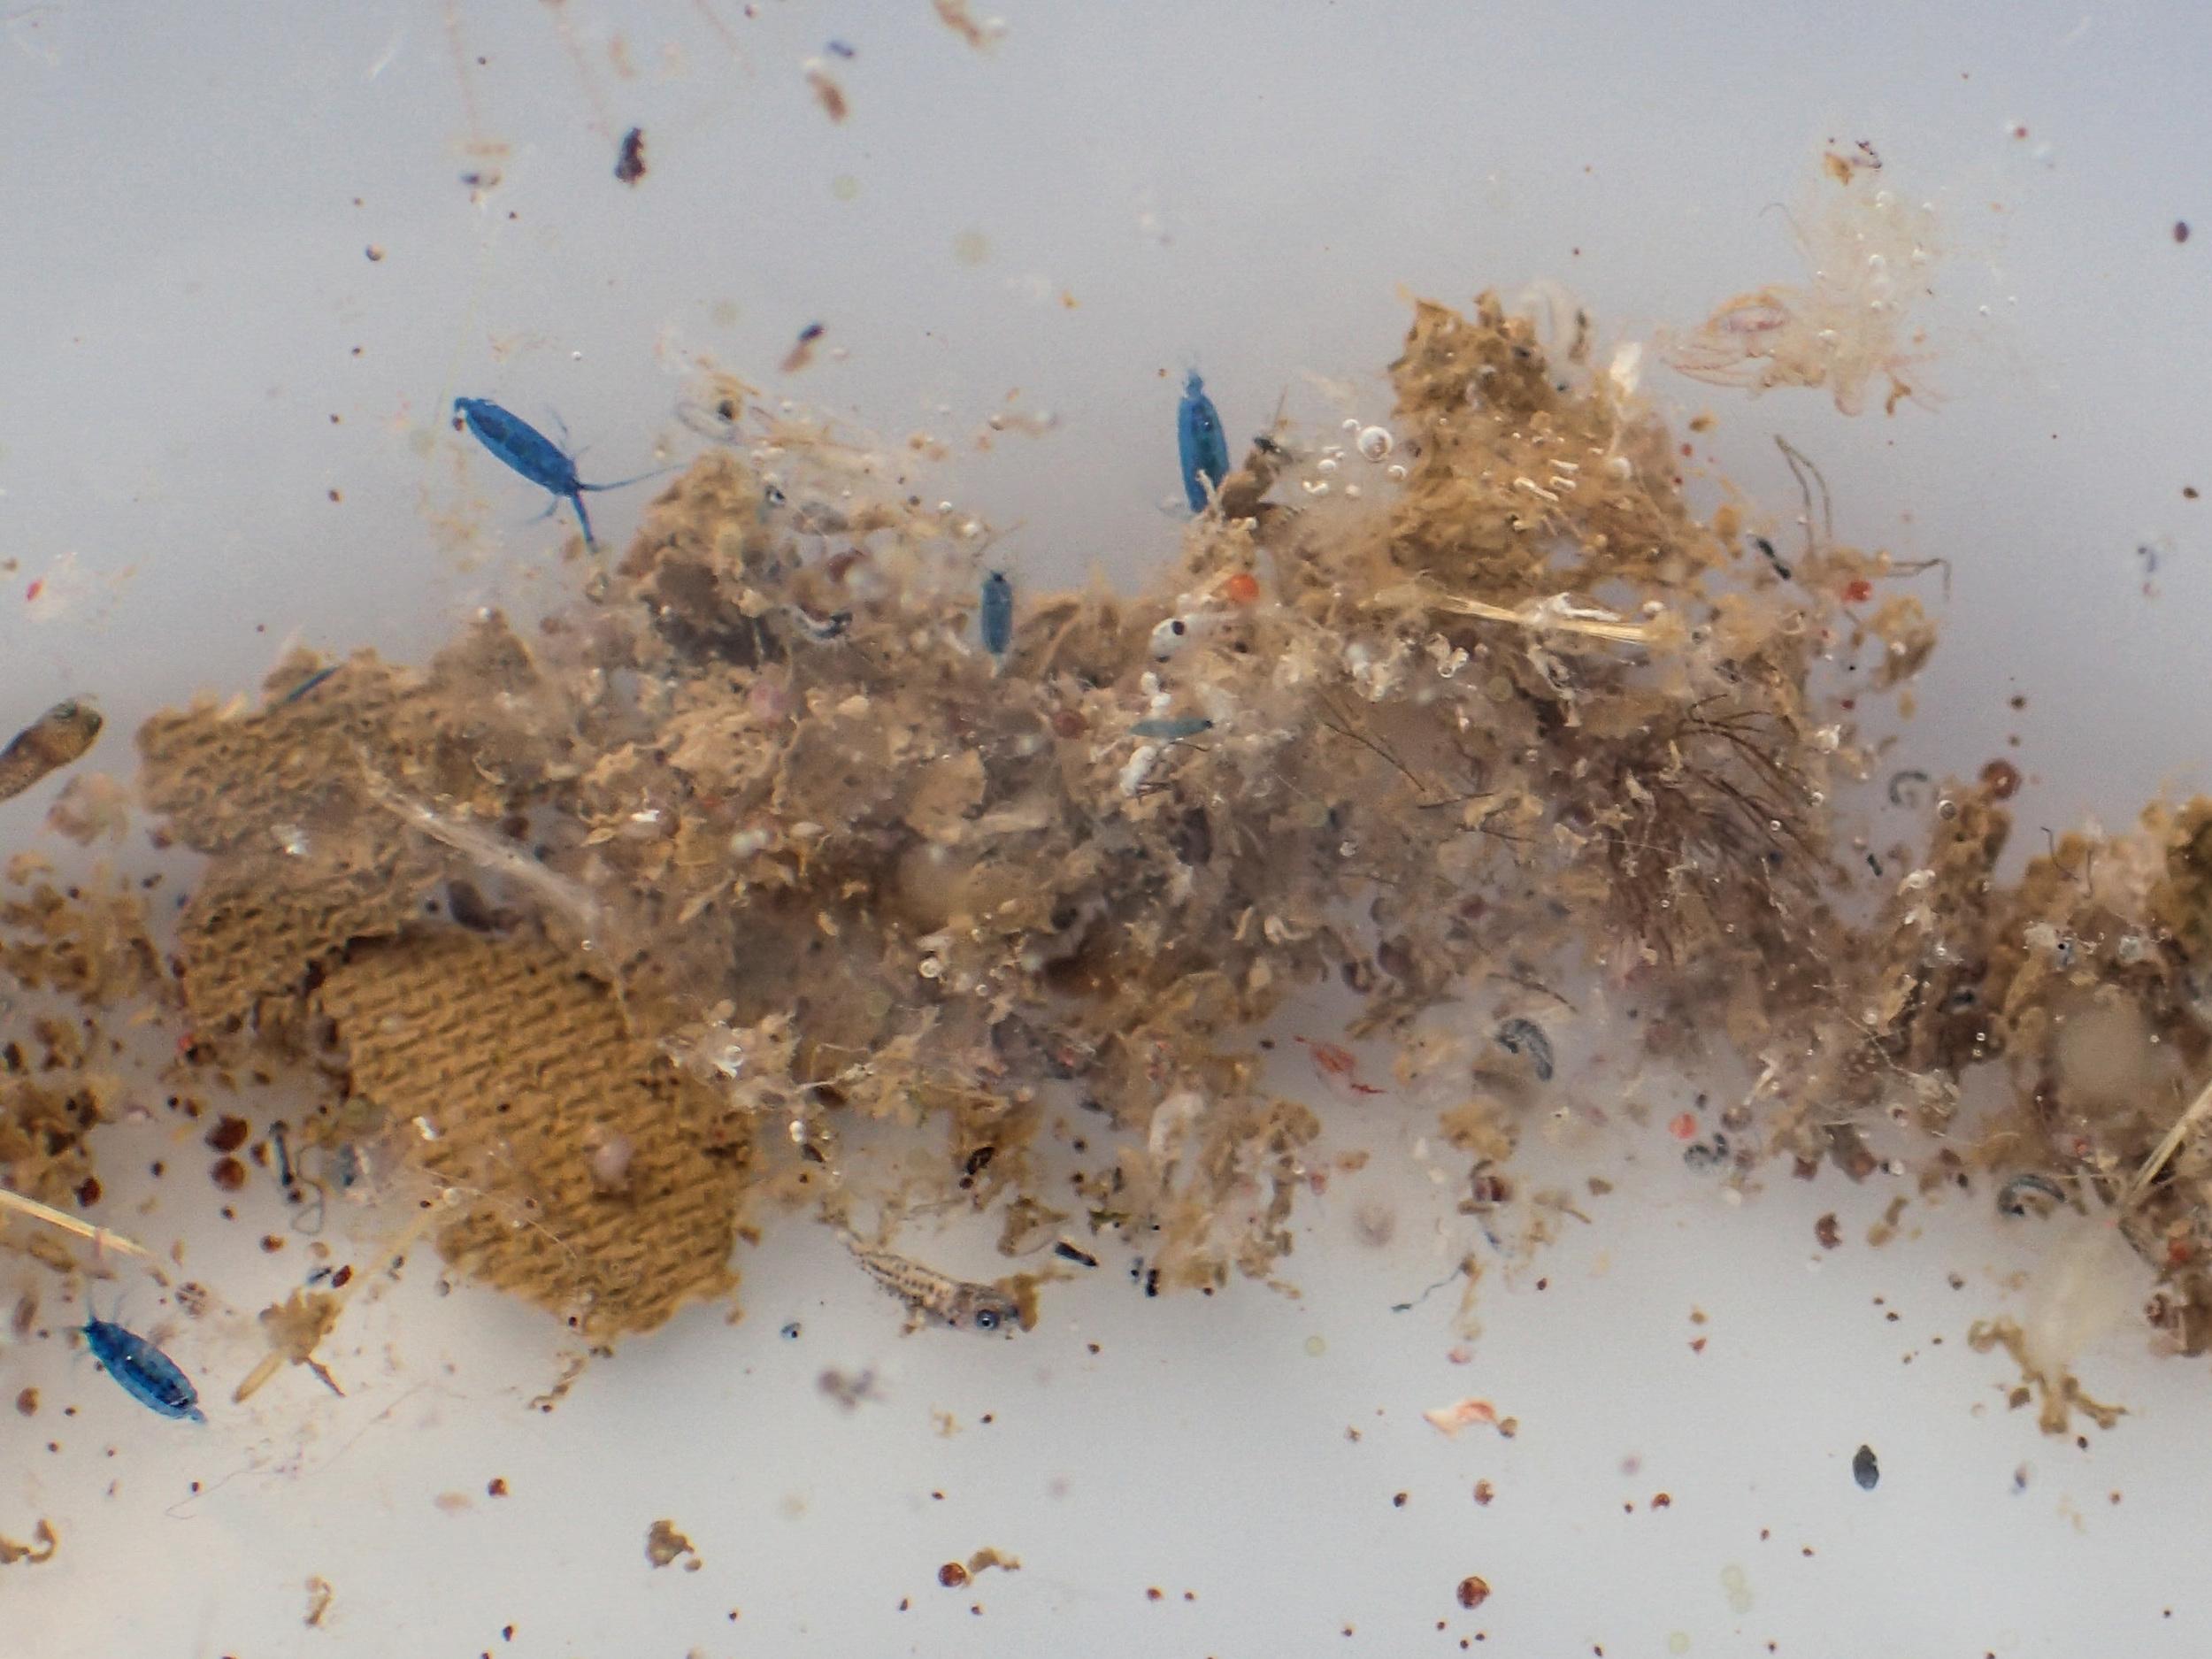 blue copepods